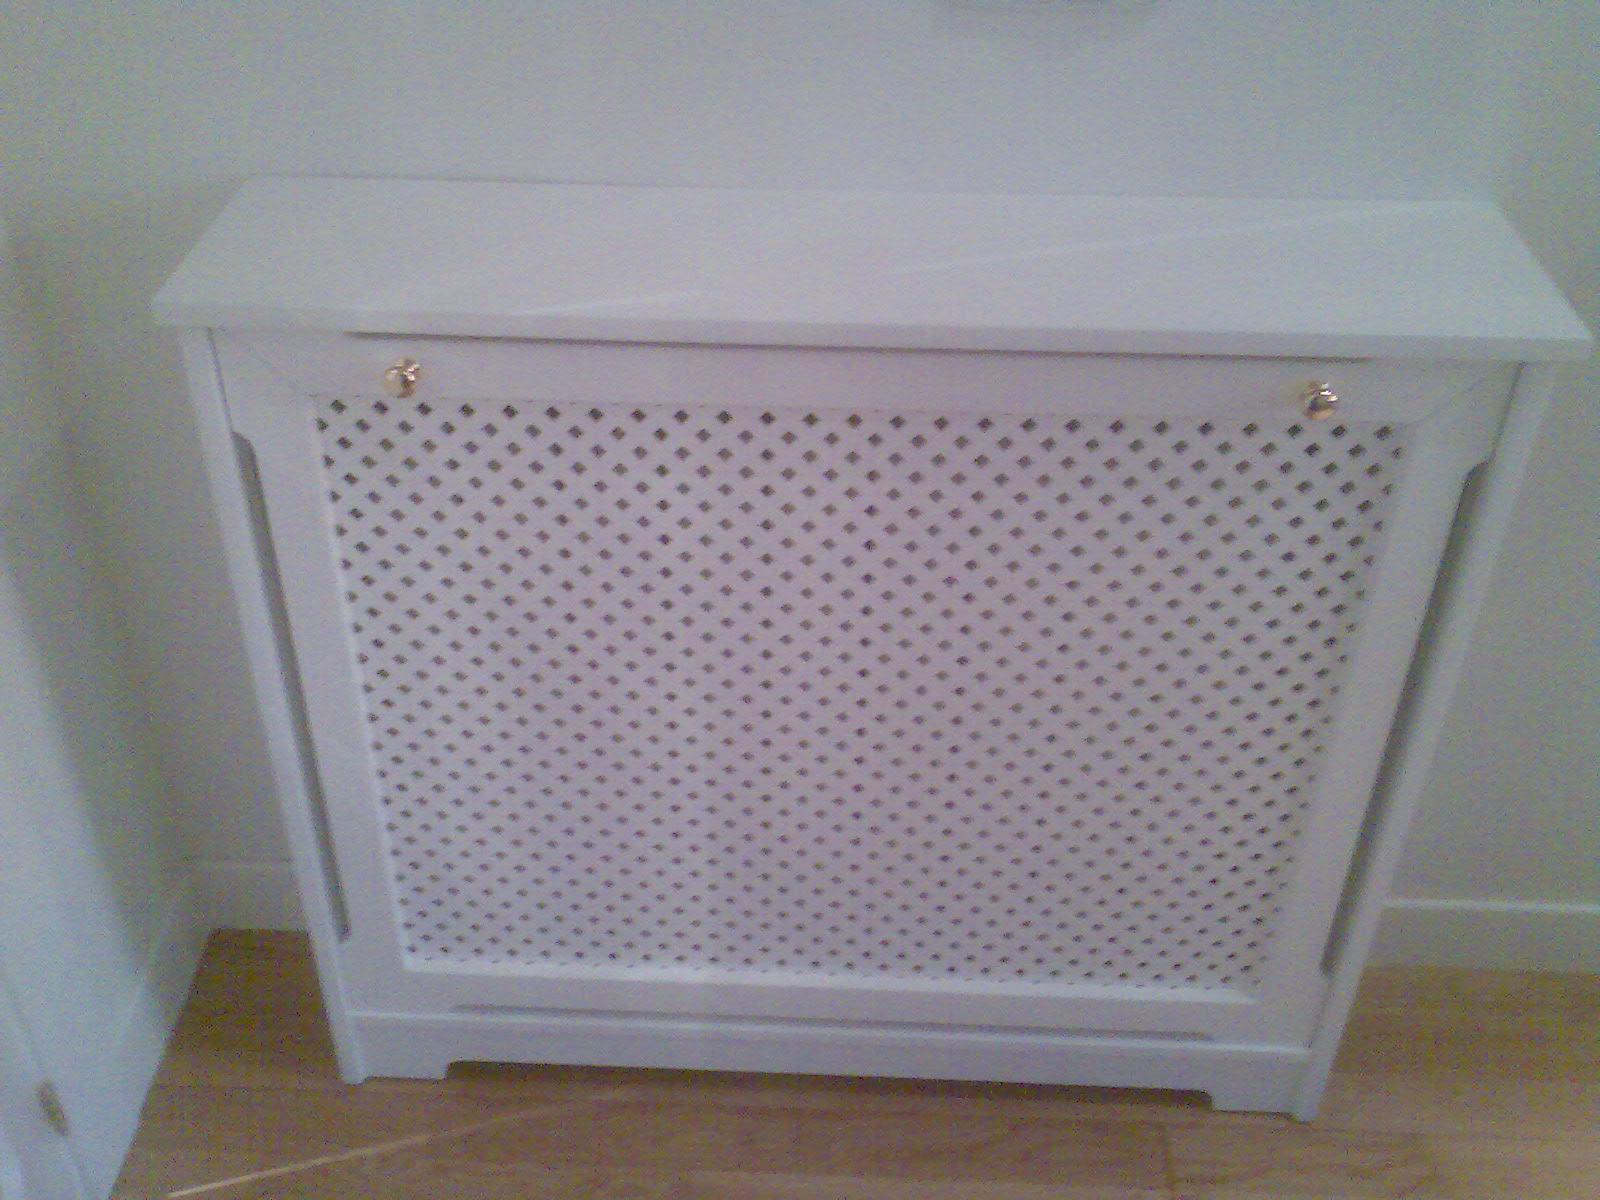 Muebles a medida modelos de curbre radiadores - Muebles para cubrir radiadores ...